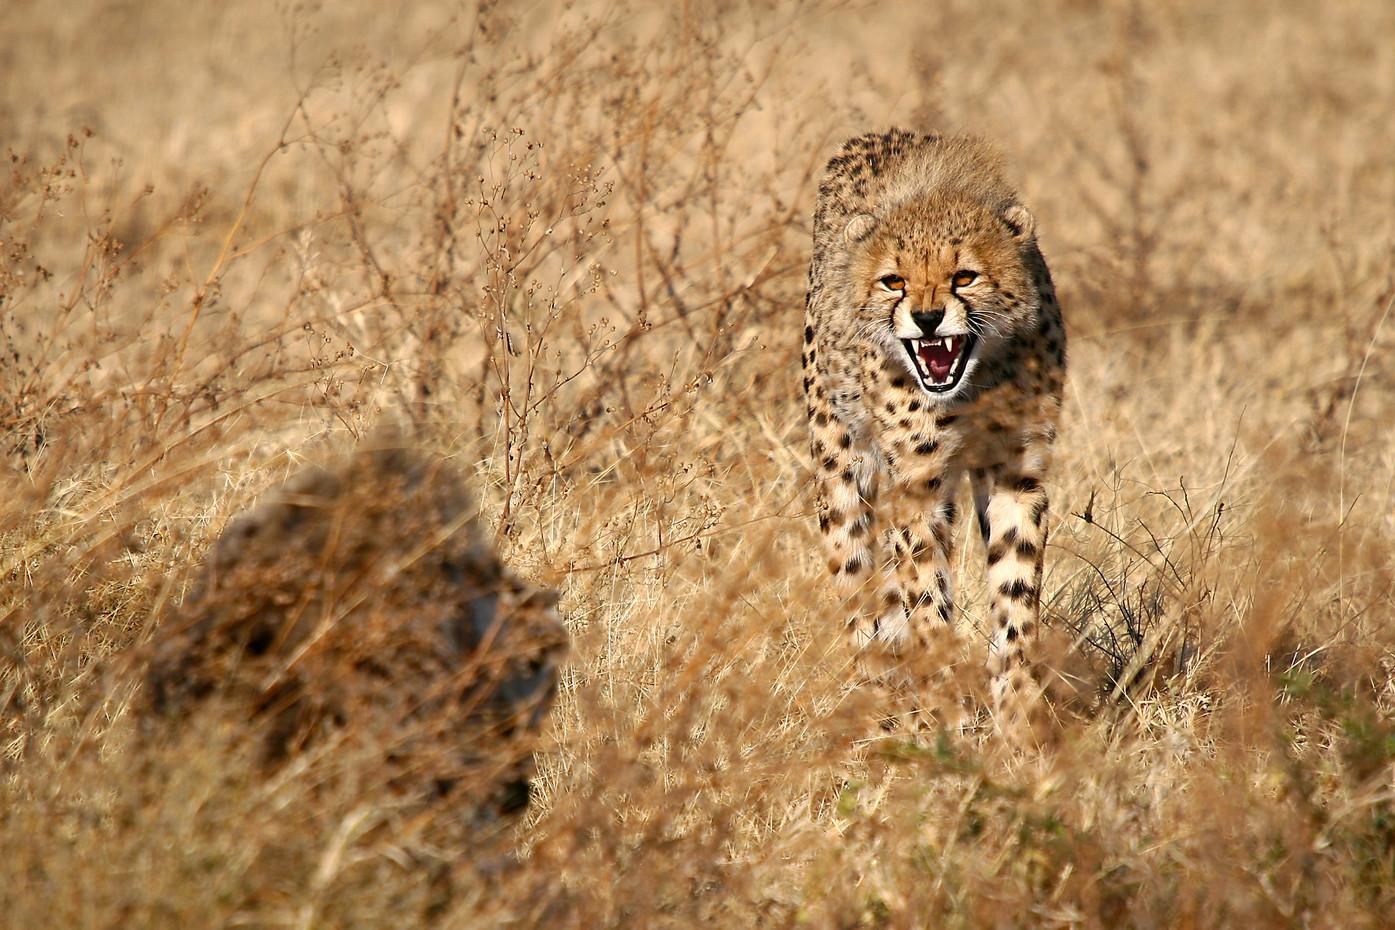 Cheetah in the Serengeti NP, Tanzania